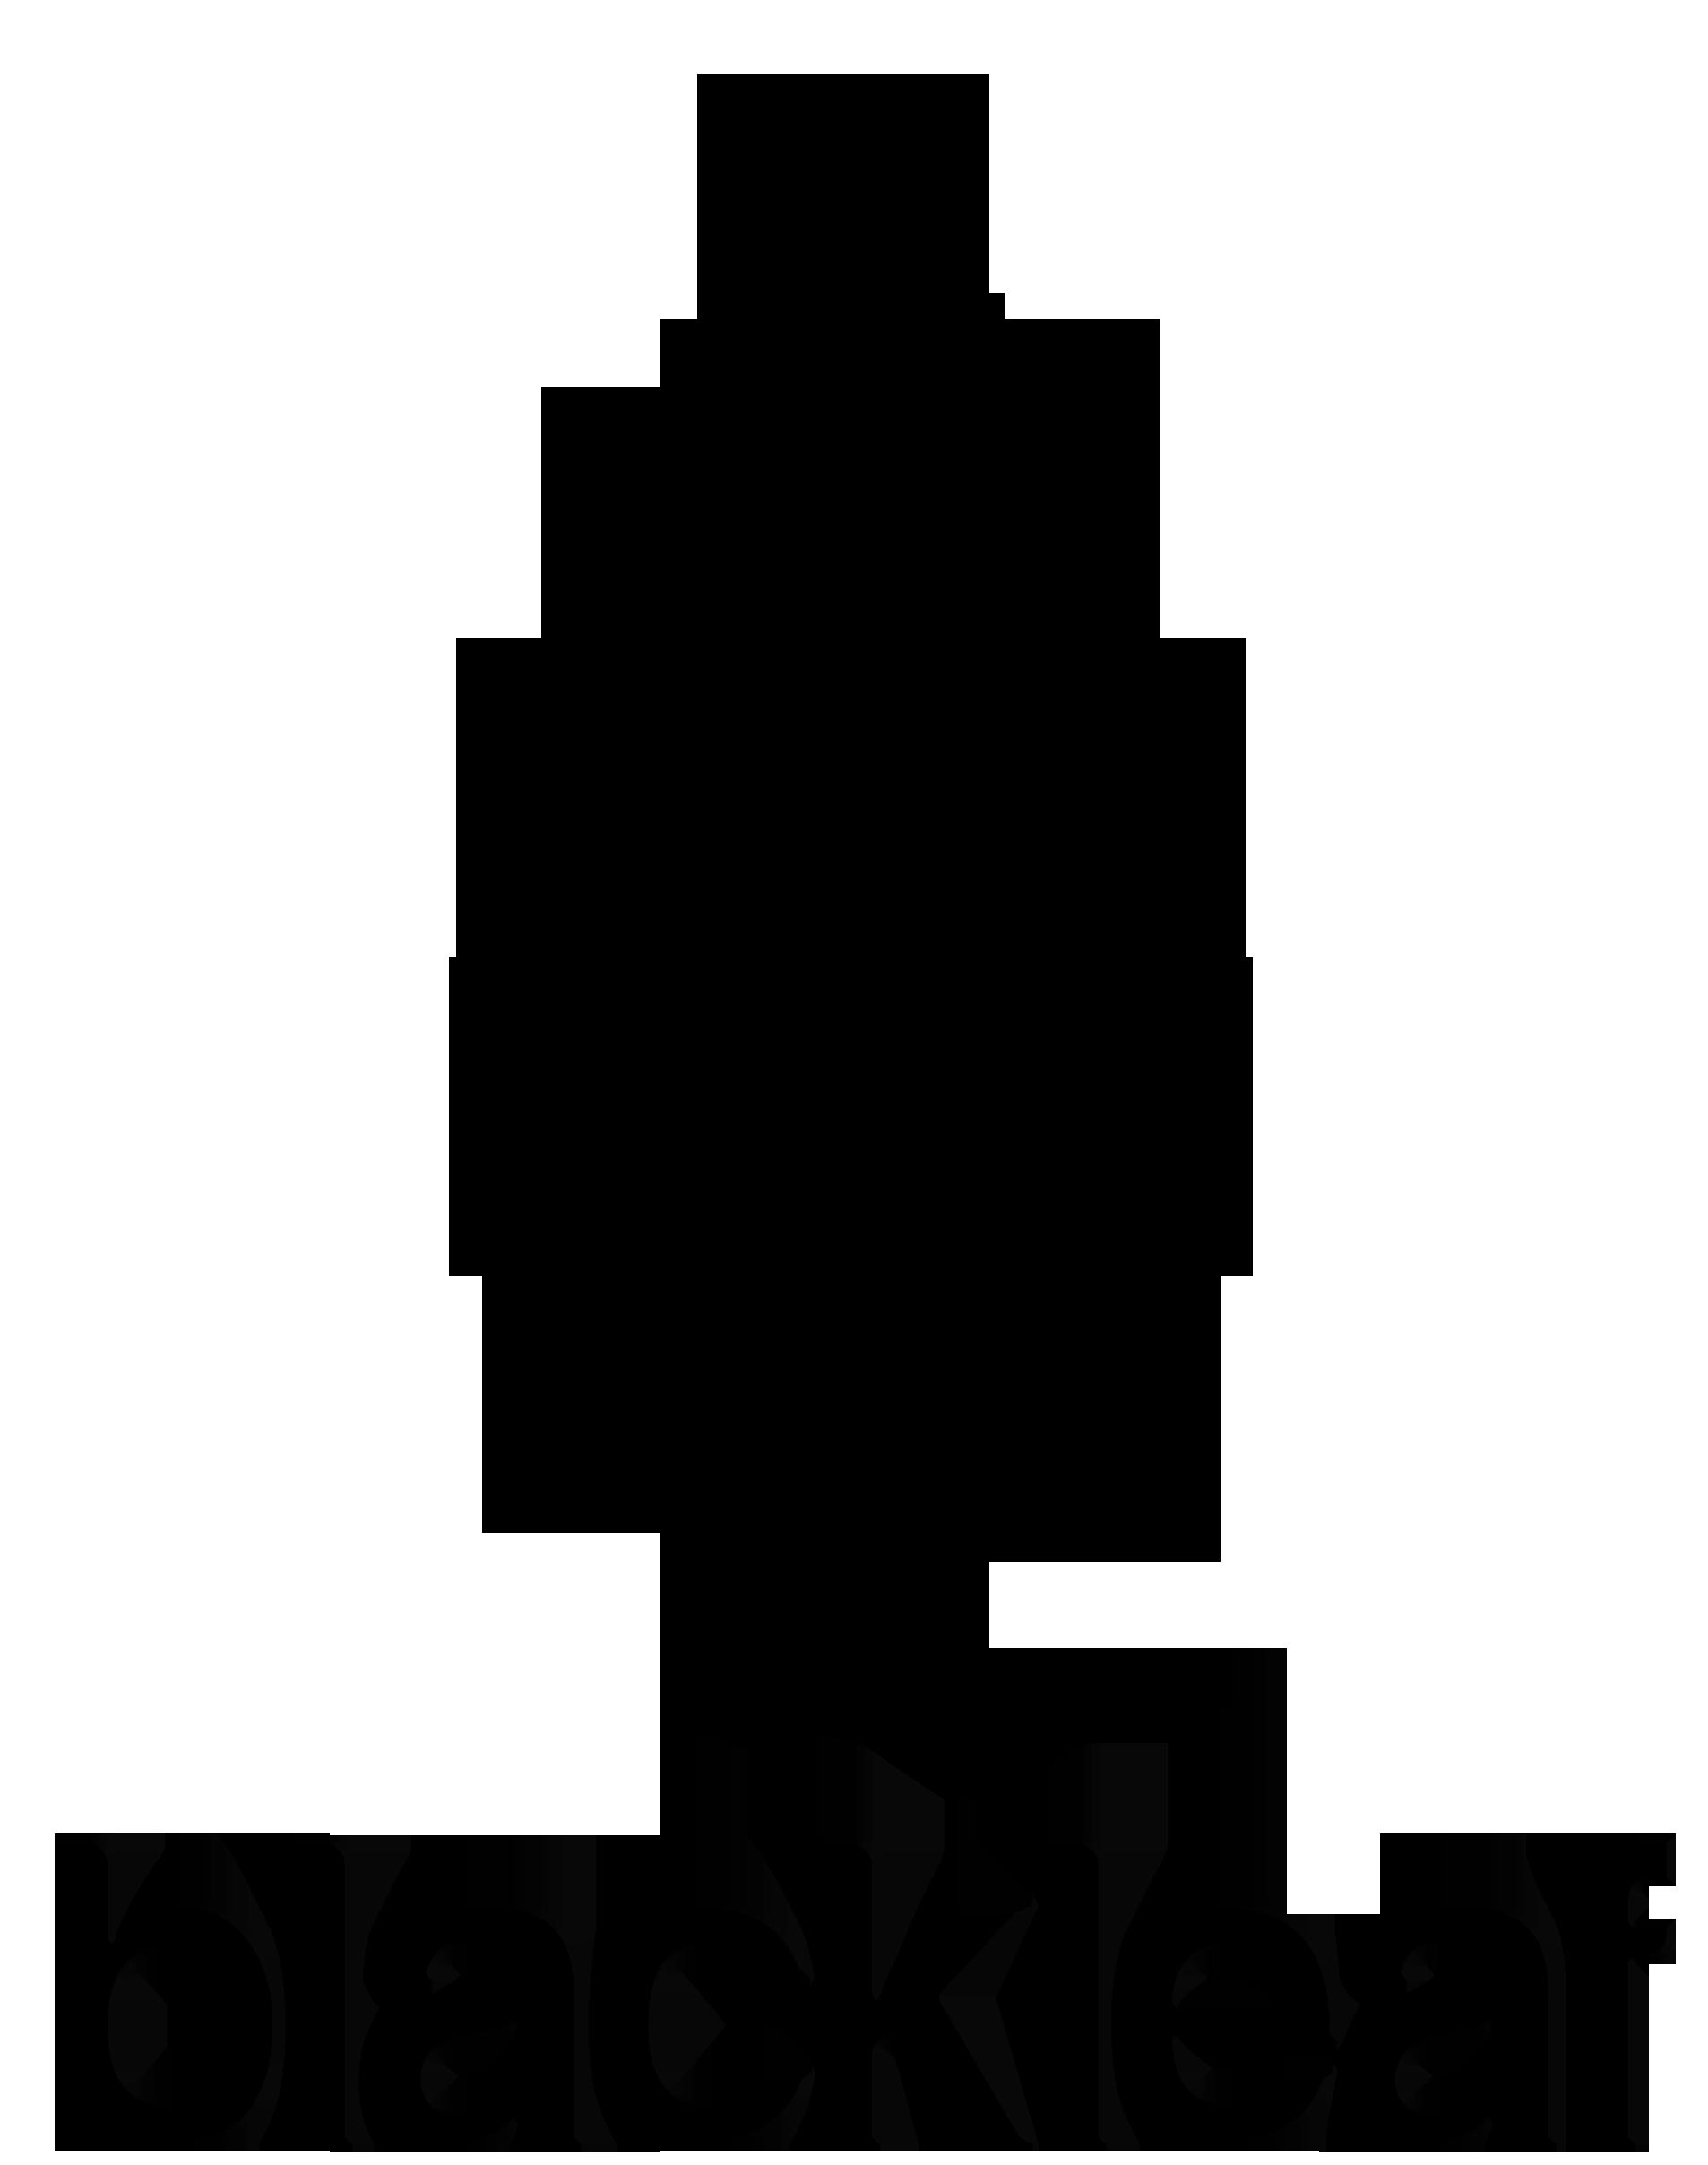 BLACKLEAFLOGO e1492029881264